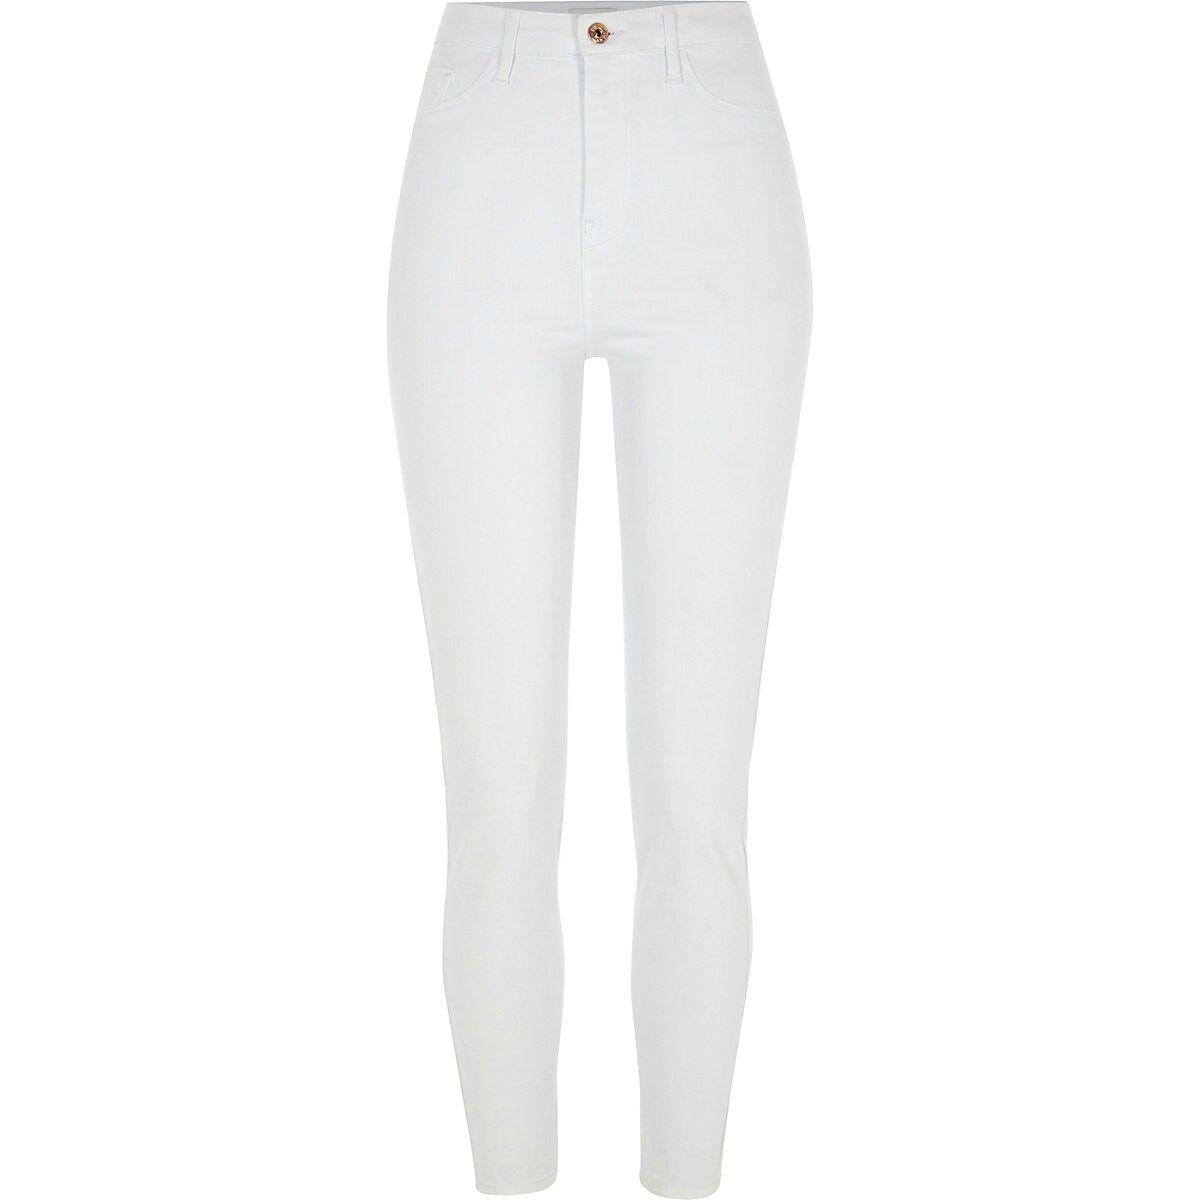 c6f9cc314e3e White Harper high rise skinny jeans   All blue baby in 2019   White ...